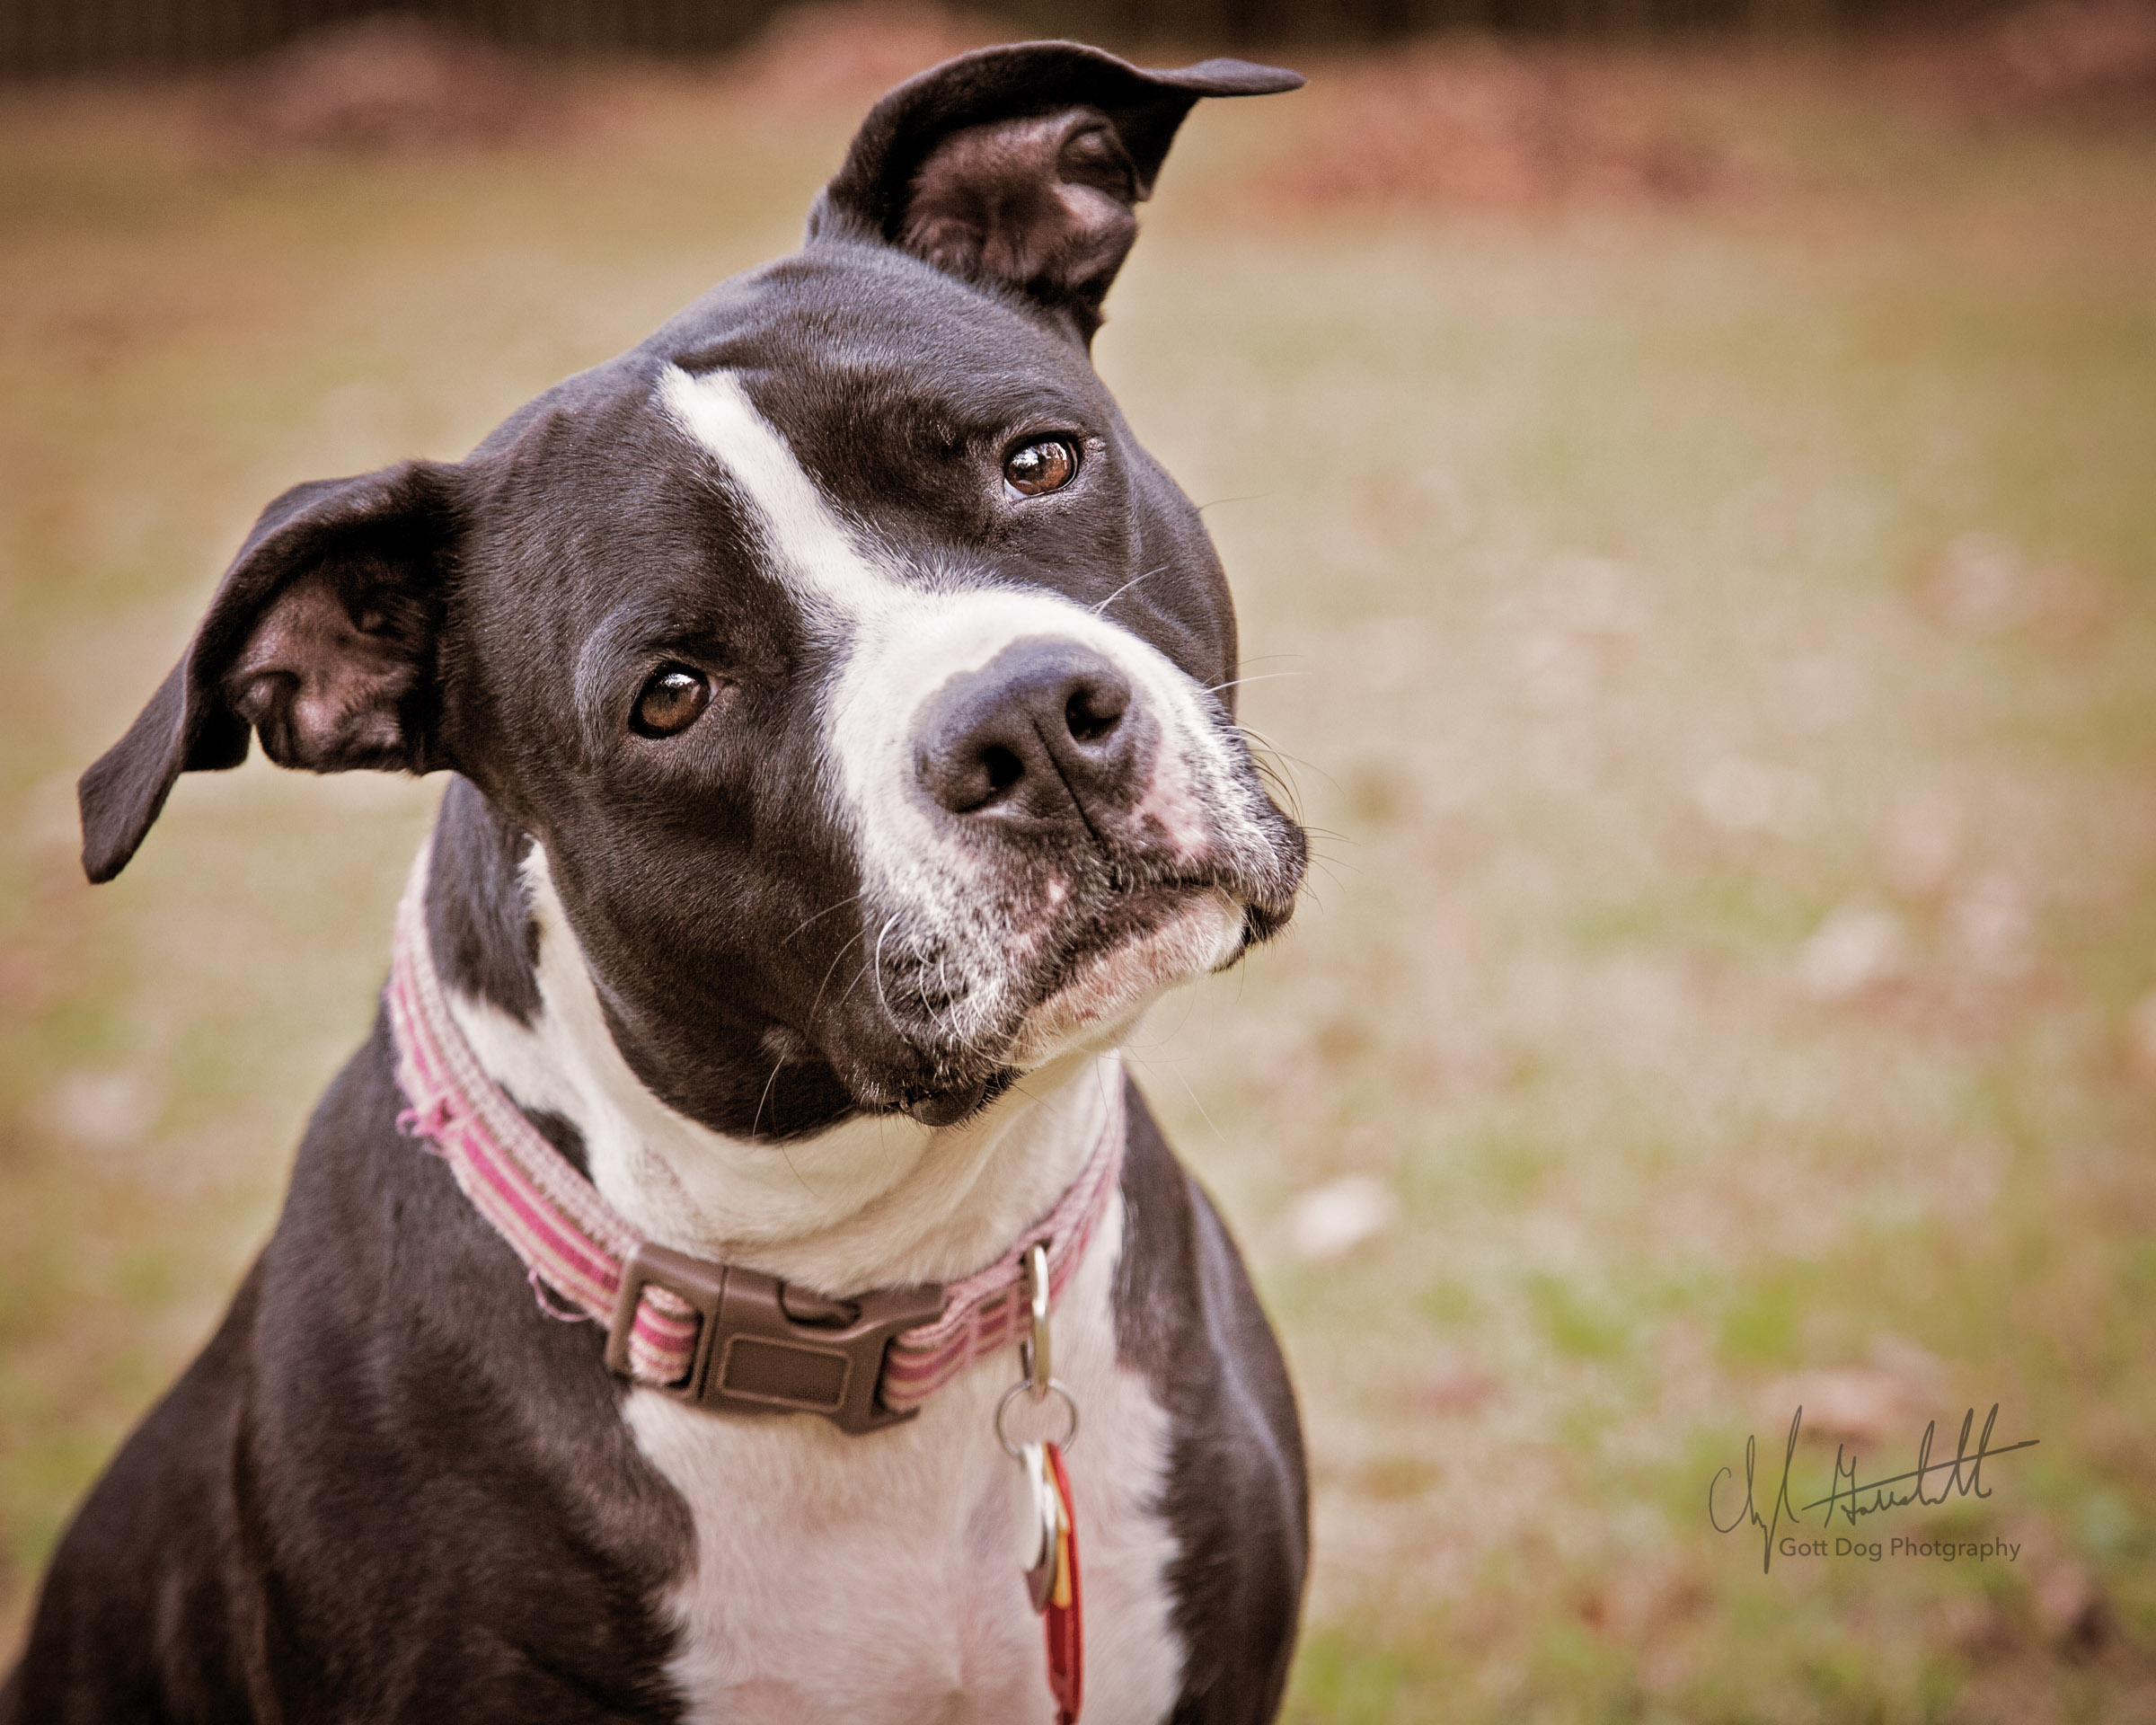 Gott Dog Photography-Rosie_2162-Edit